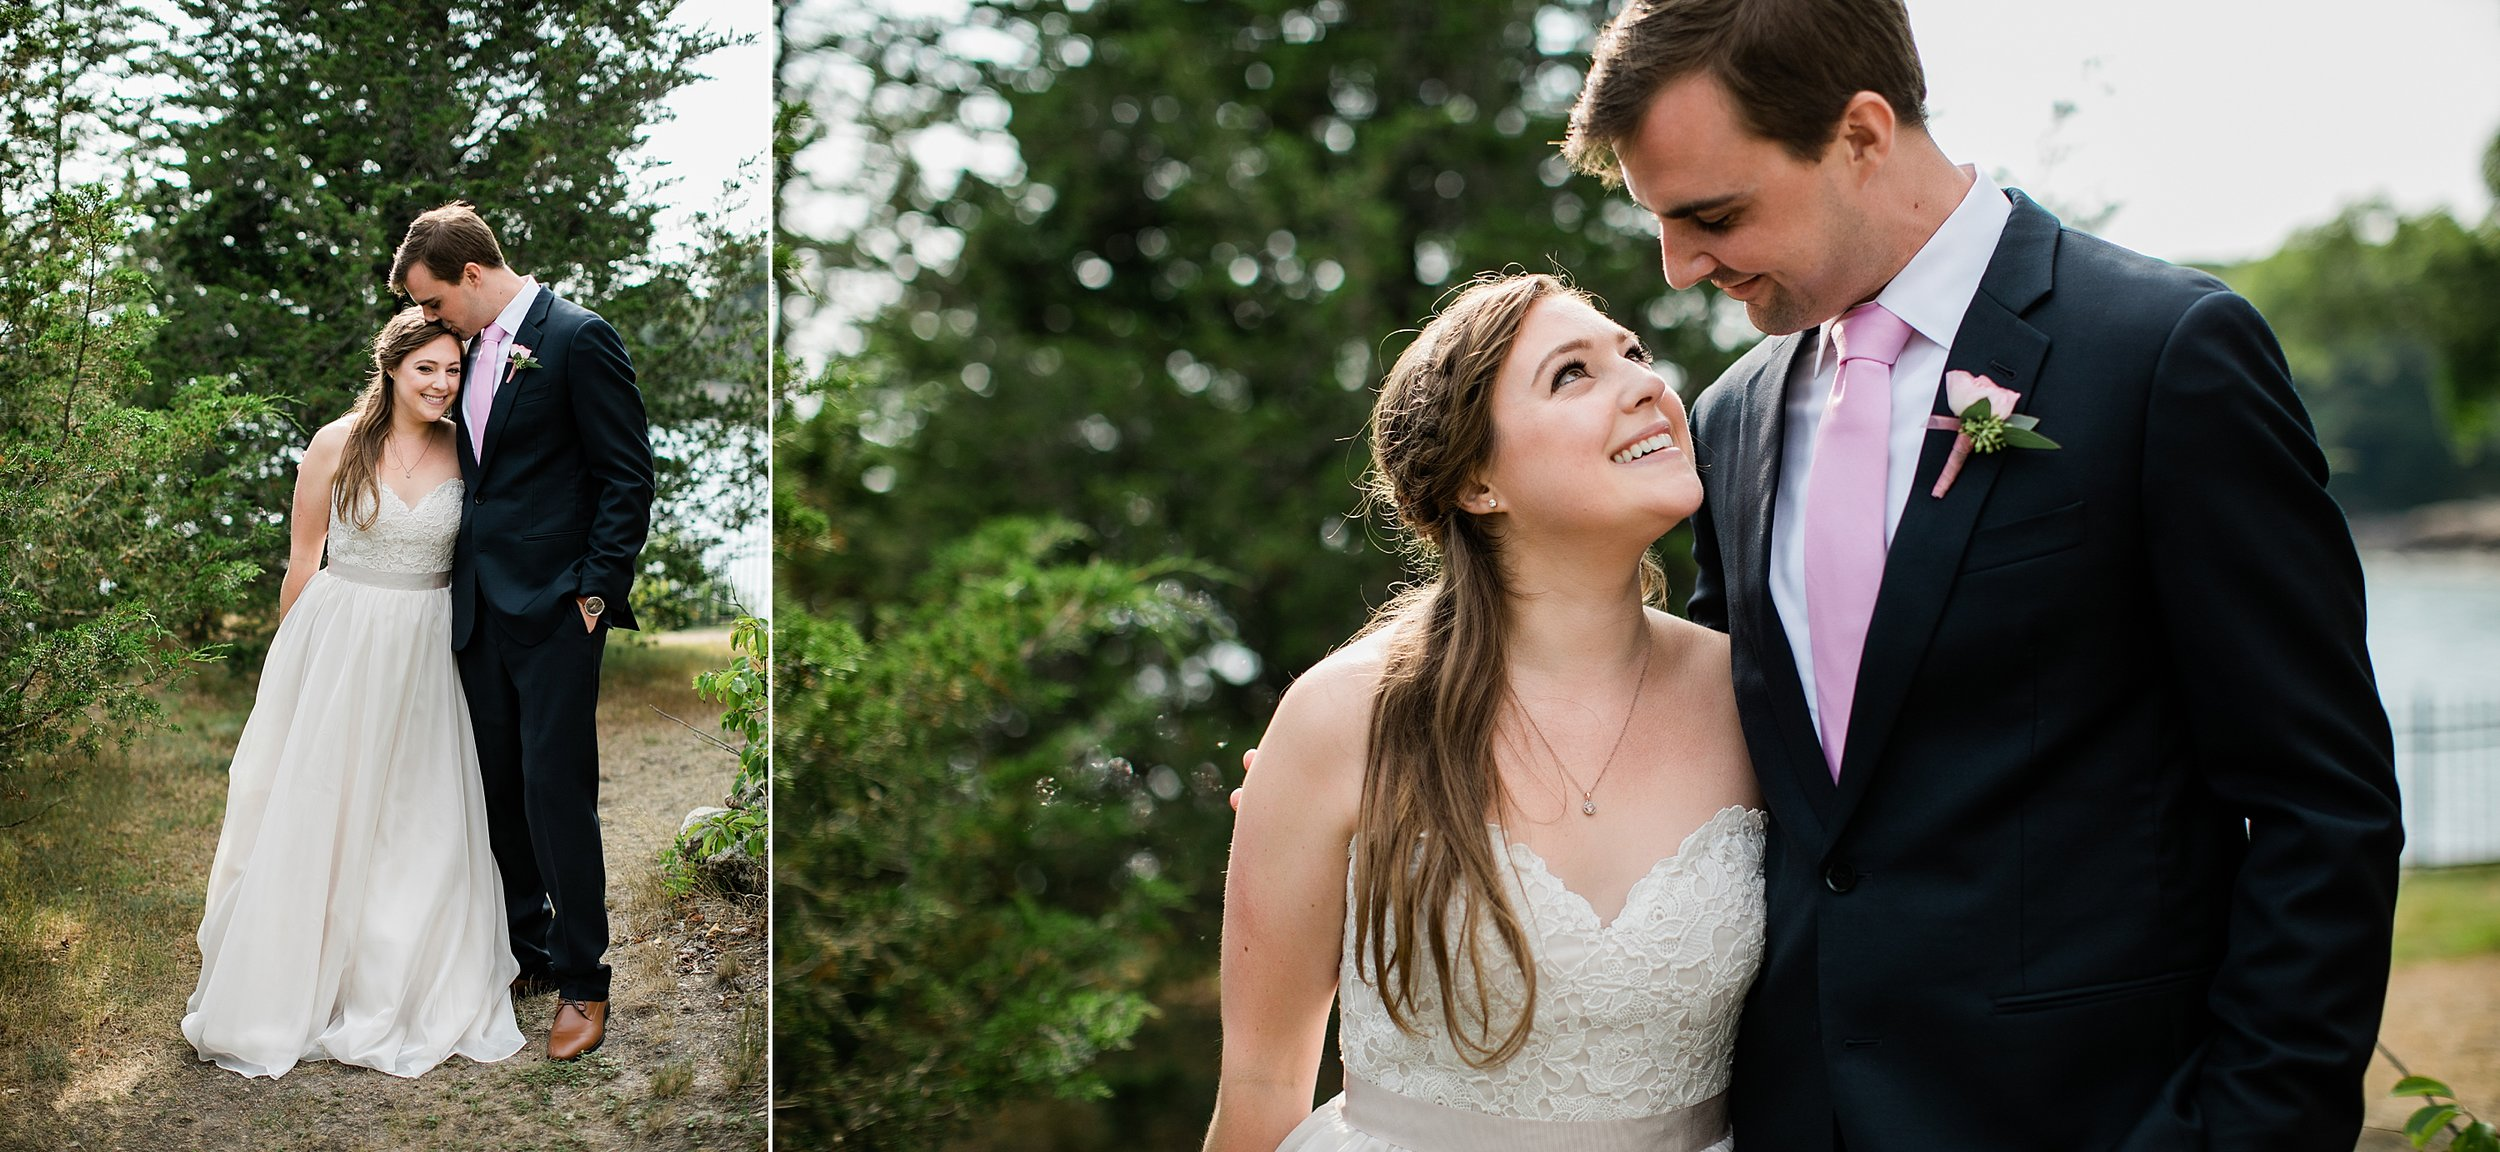 016 los angeles wedding photographer todd danforth photography boston.jpg